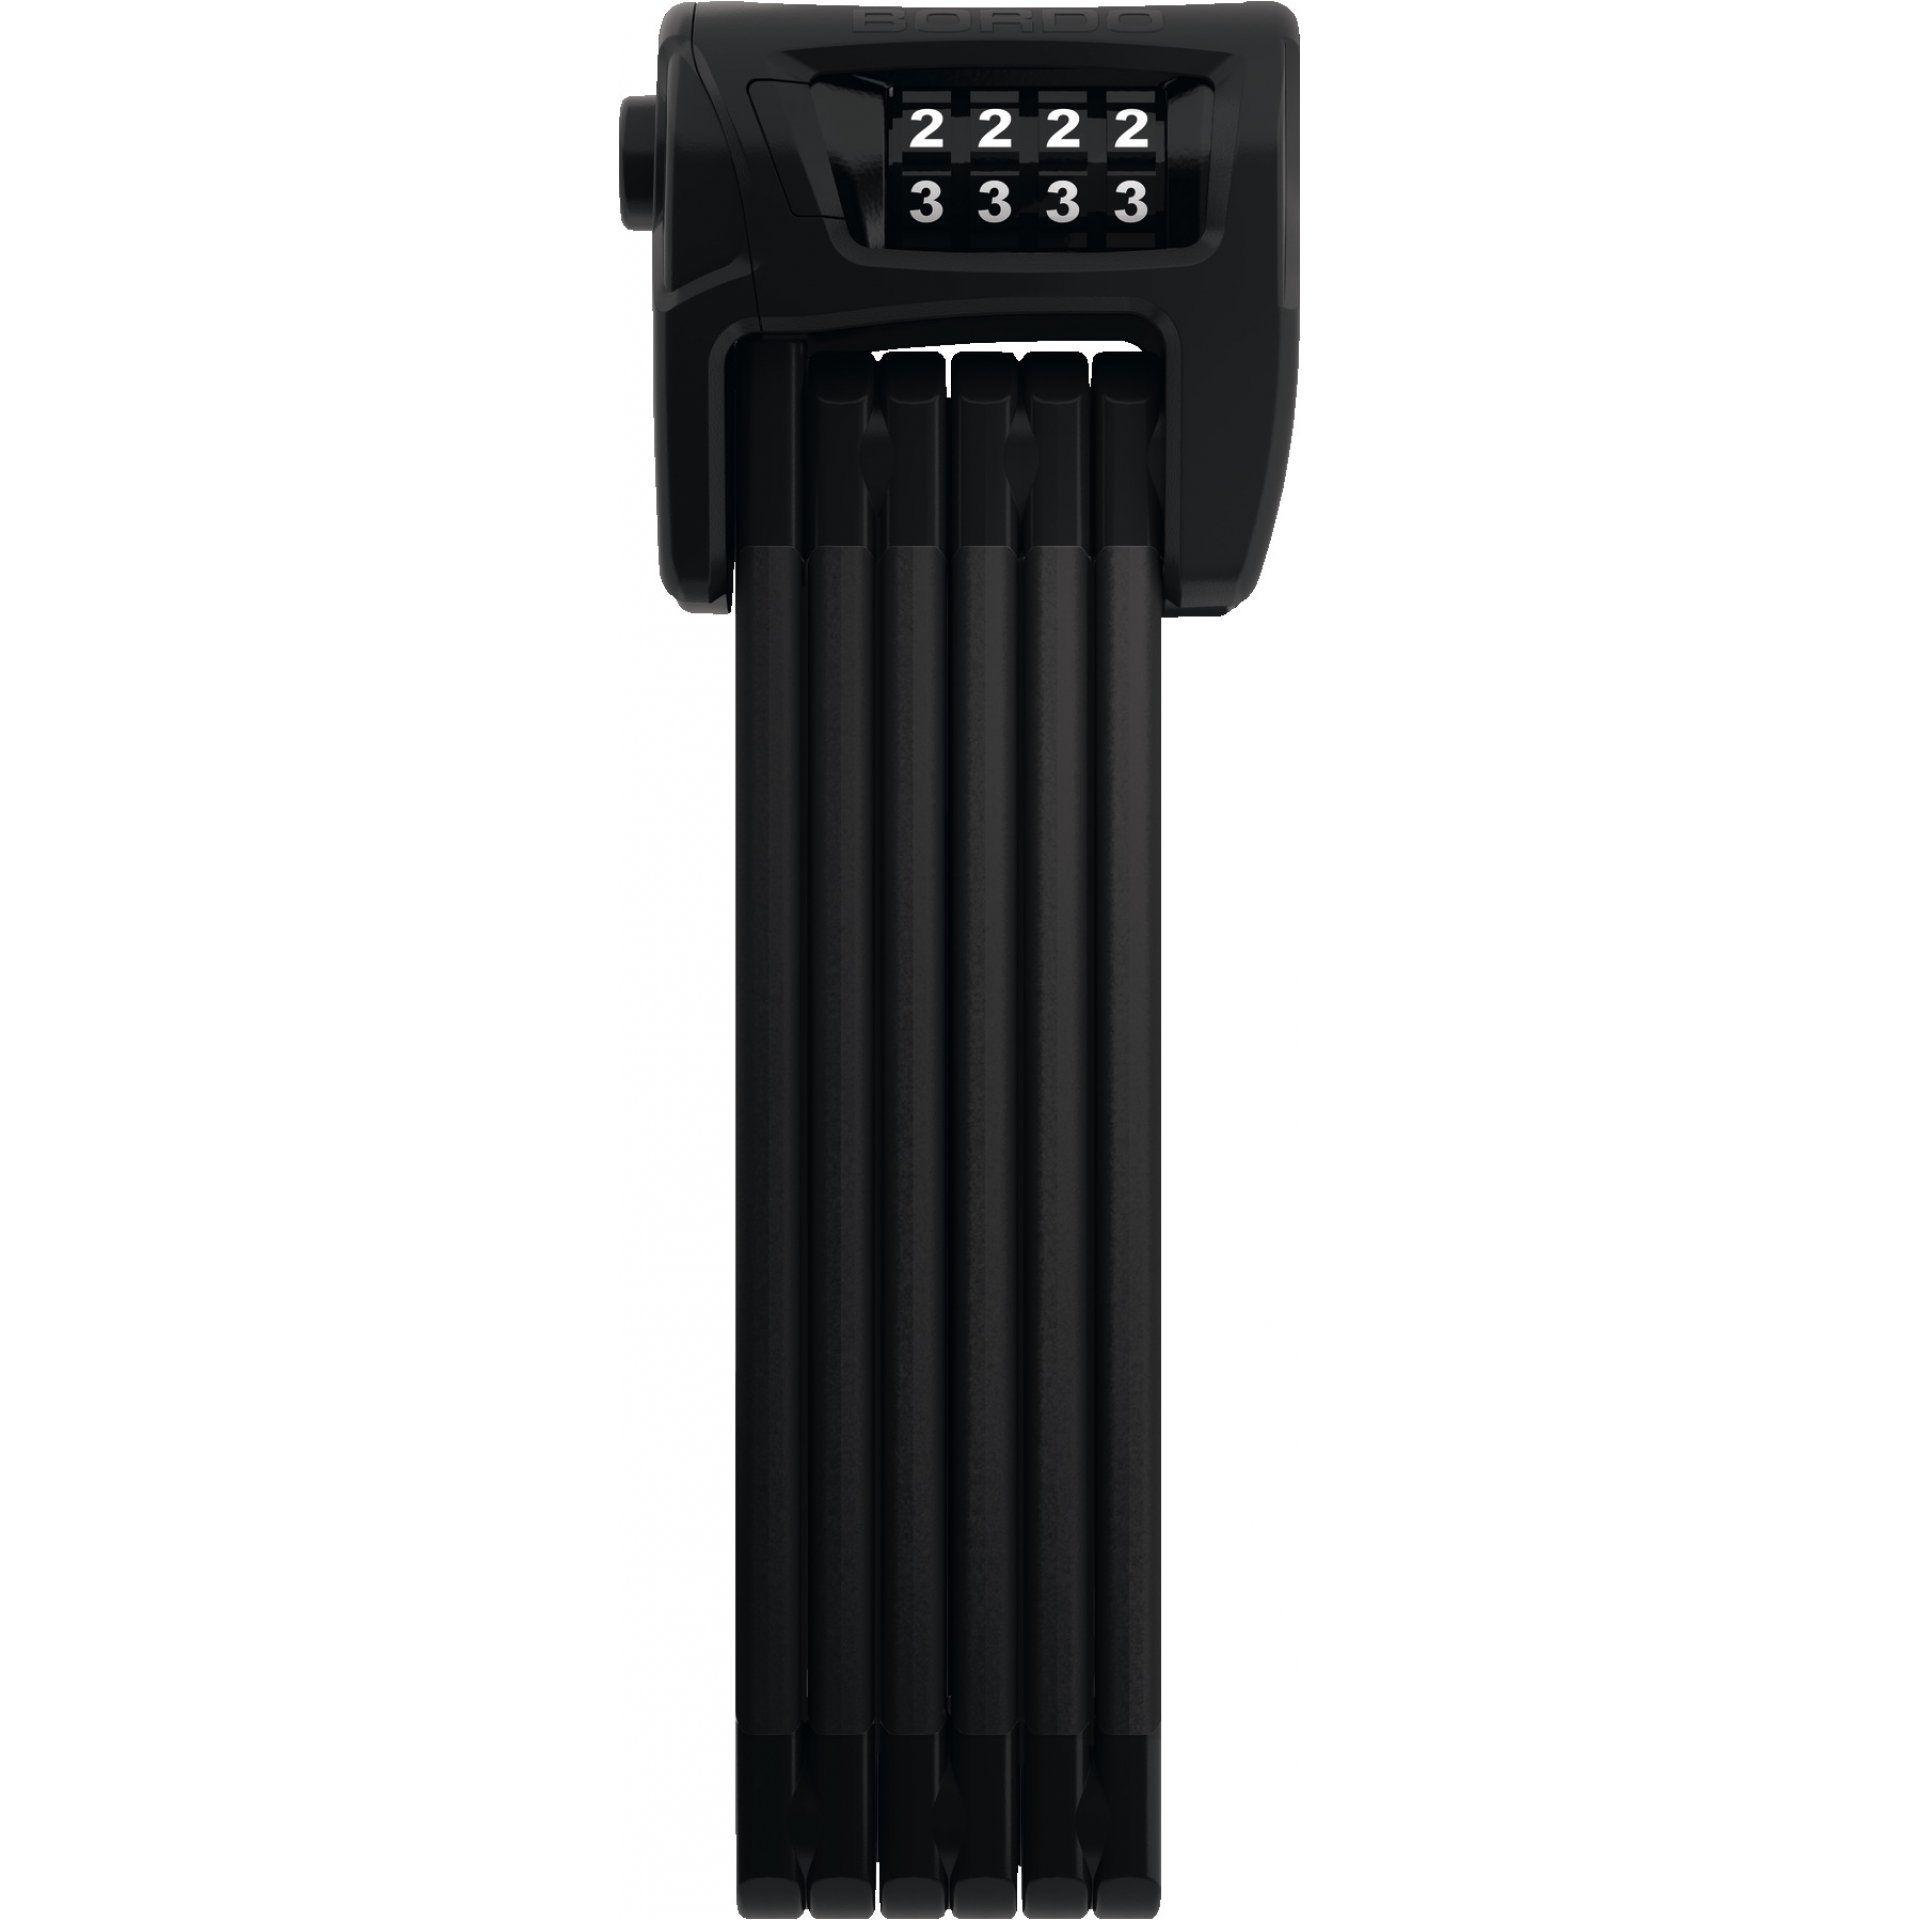 ZAPIĘCIE ROWEROWE ABUS BORDO COMBO SH 6100|90 BLACK 1